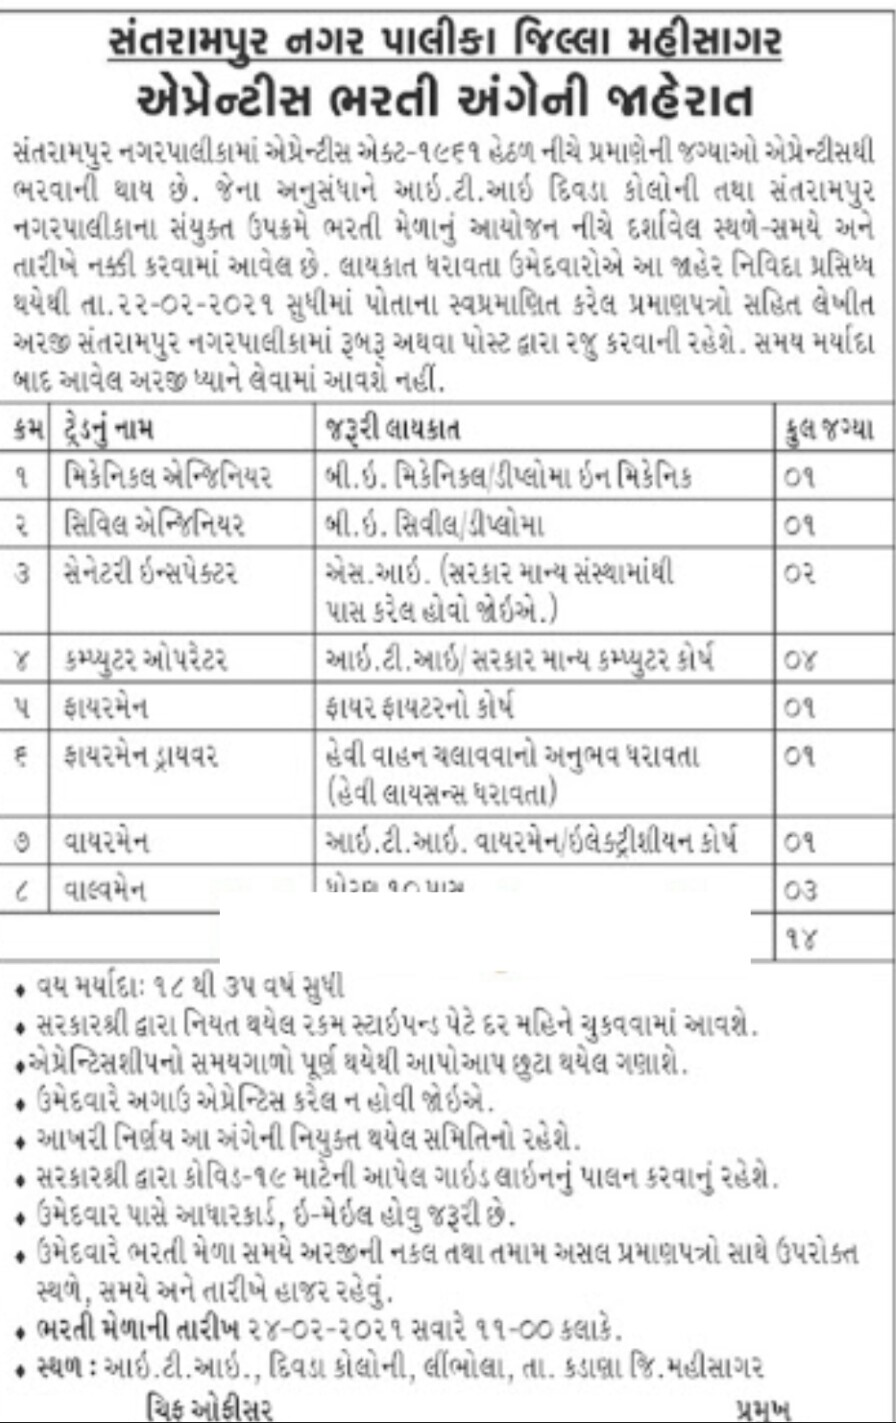 Santrampur Nagarpalika Apprentice Recruitment 2021 / Apprentice Recruitment 2021